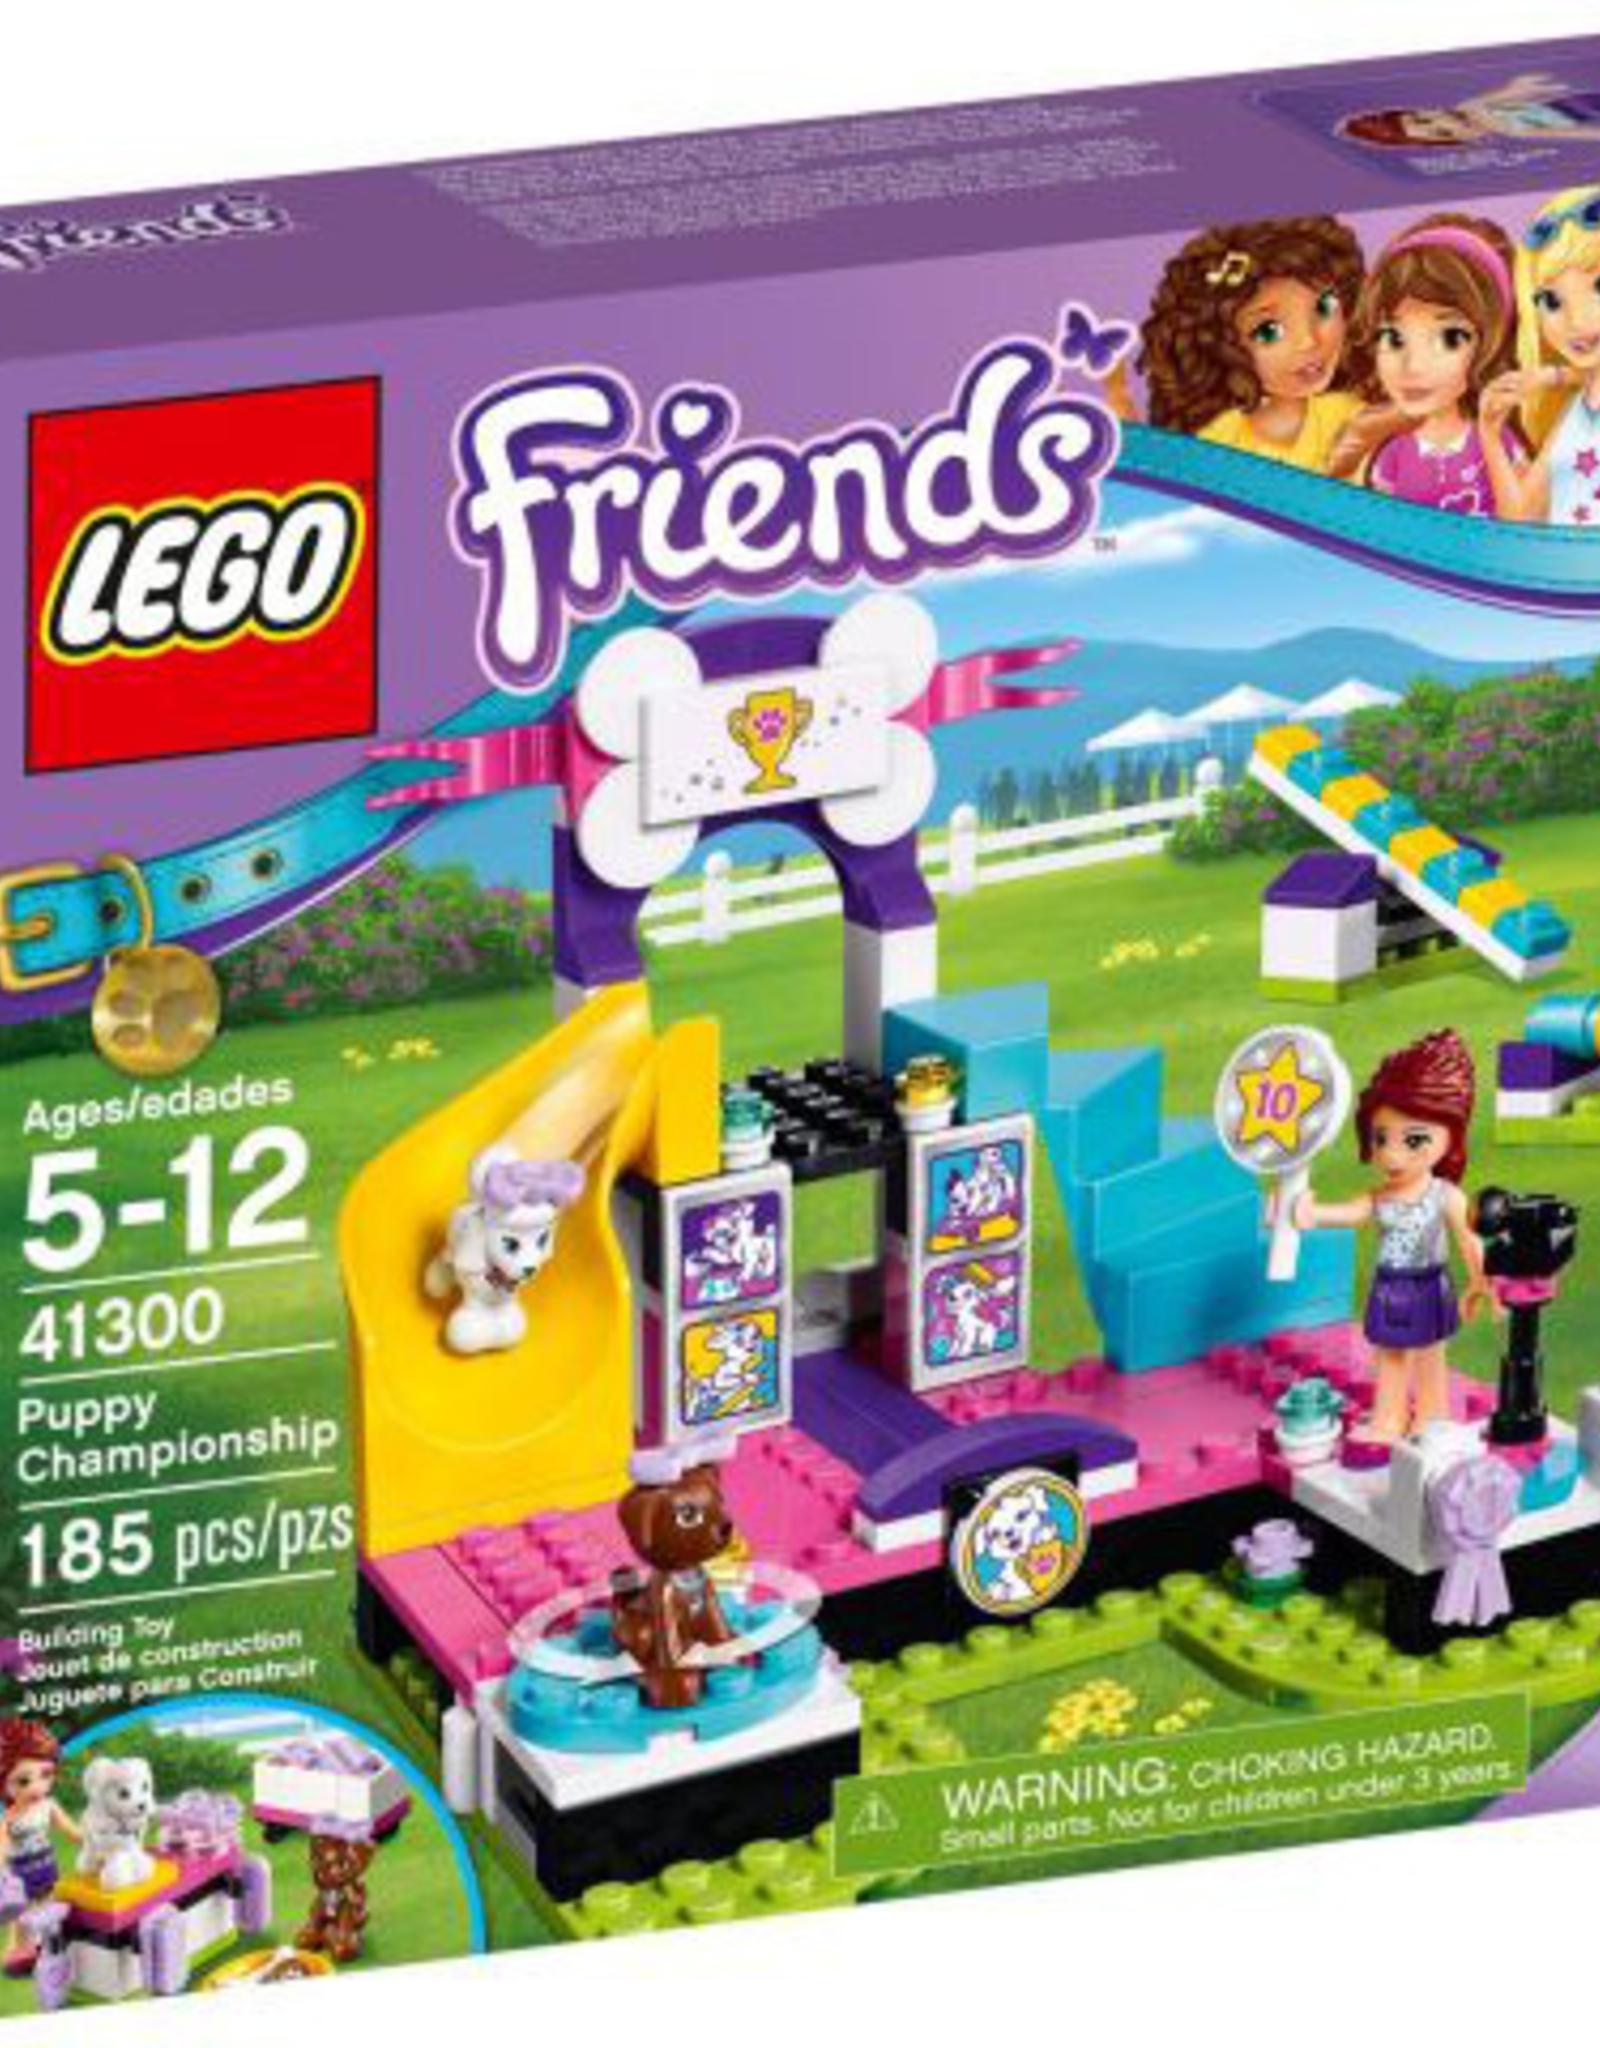 LEGO LEGO 41300 Puppy Championship FRIENDS